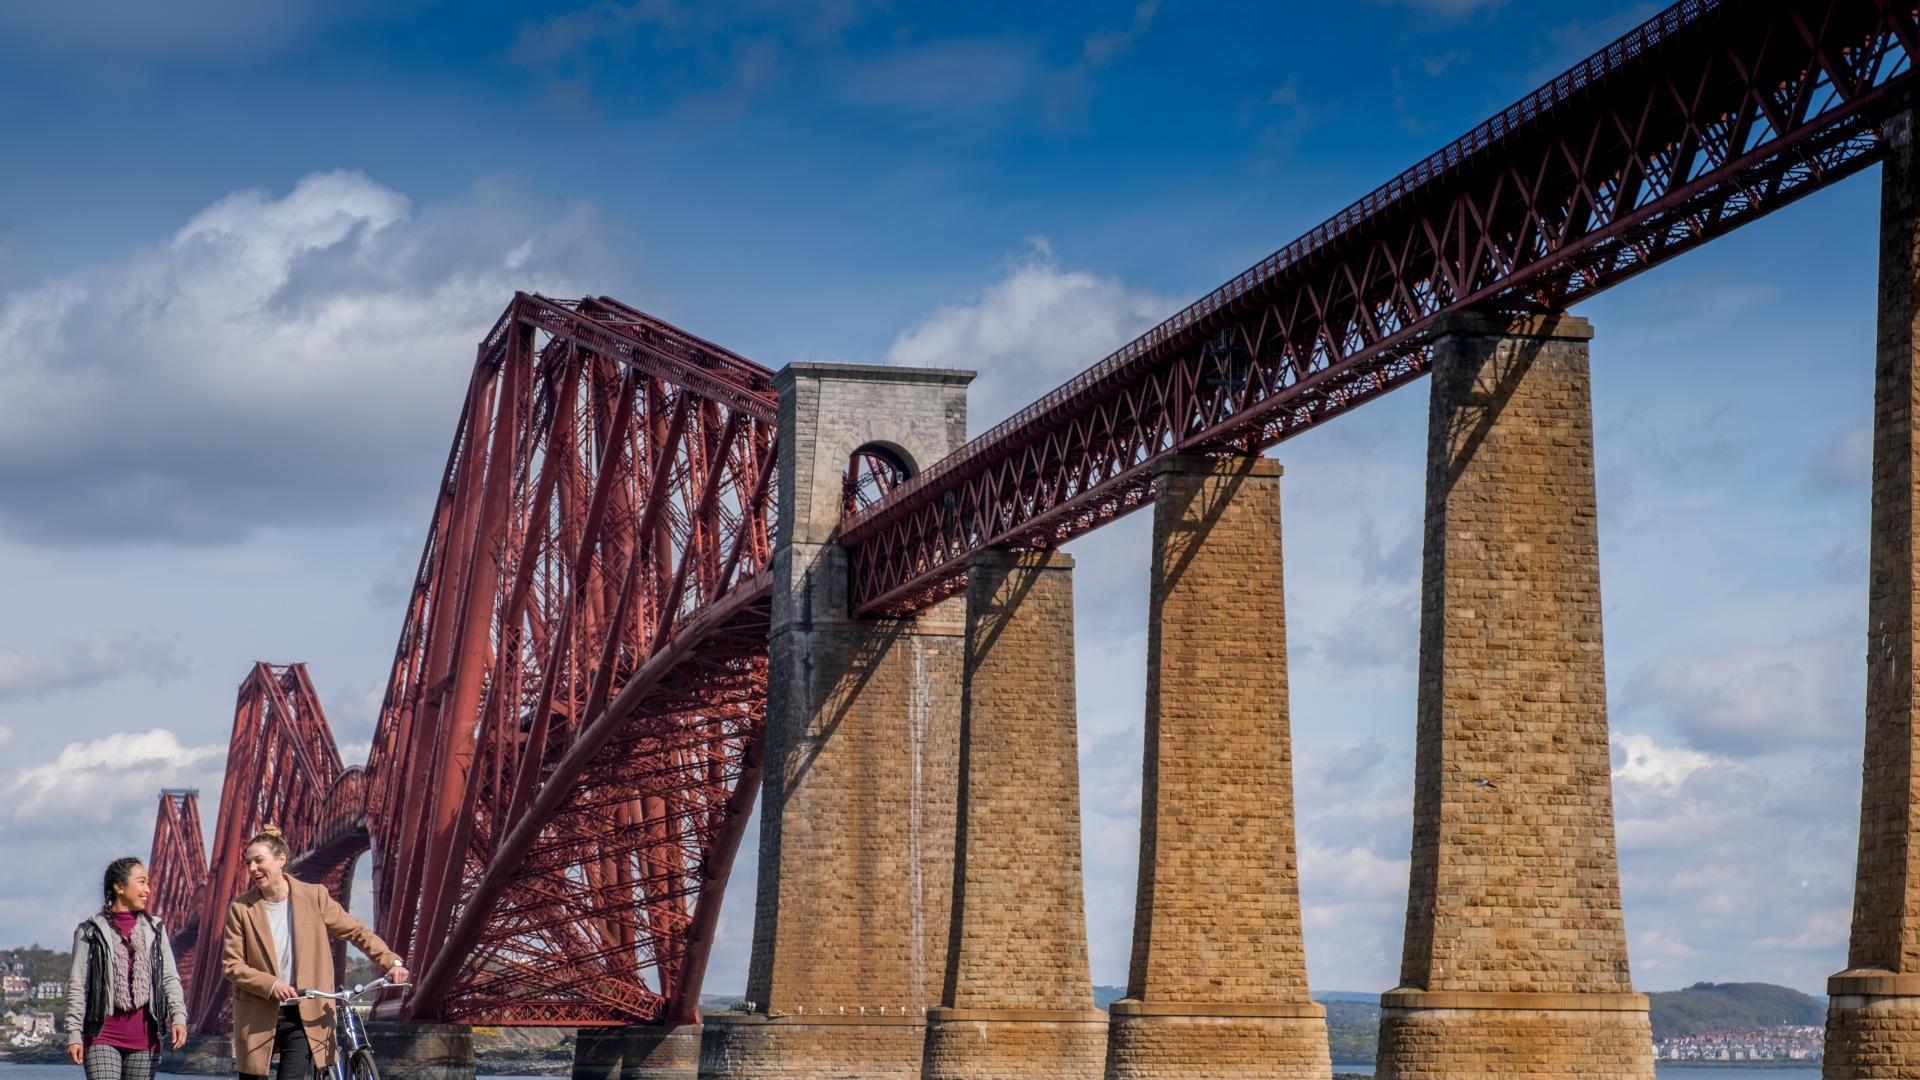 Edinburgh to the Forth Road Bridge - Sustrans.org.uk